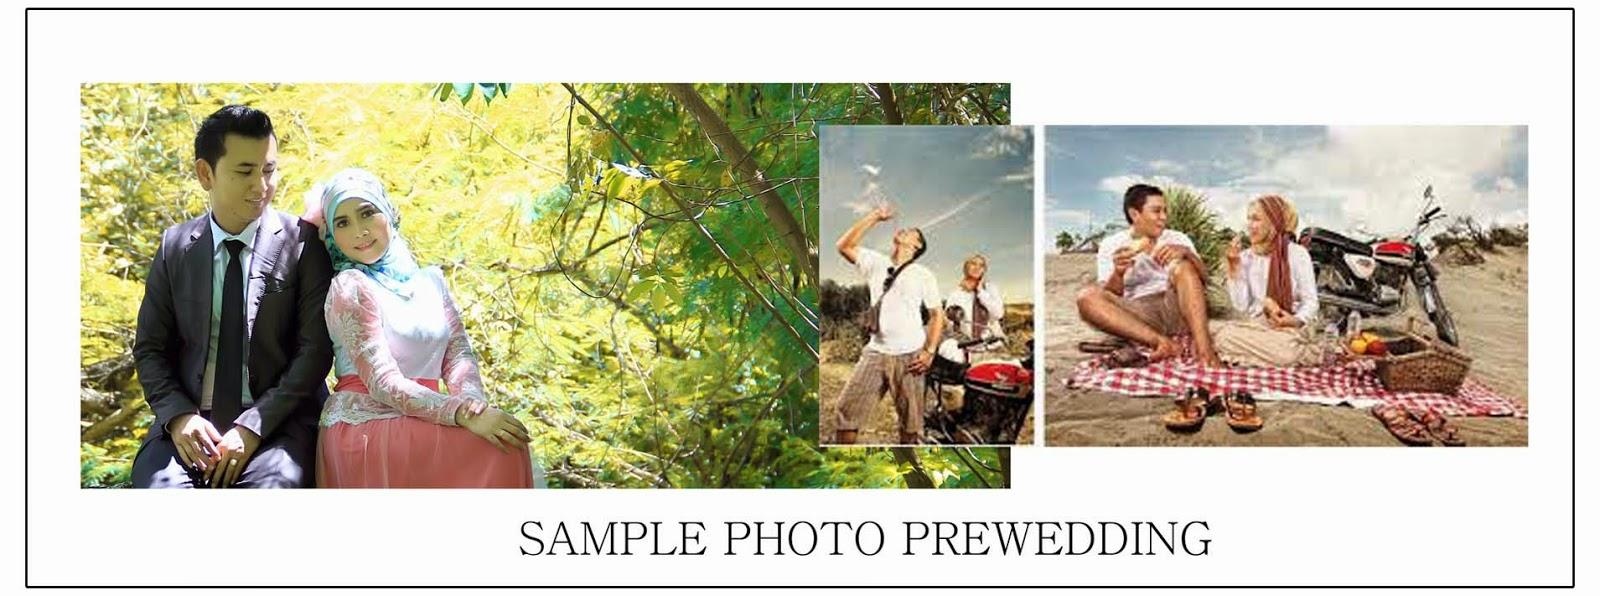 foto prewedding wanita berjilbab,kumpulan gambar pre wedding,contoh ...